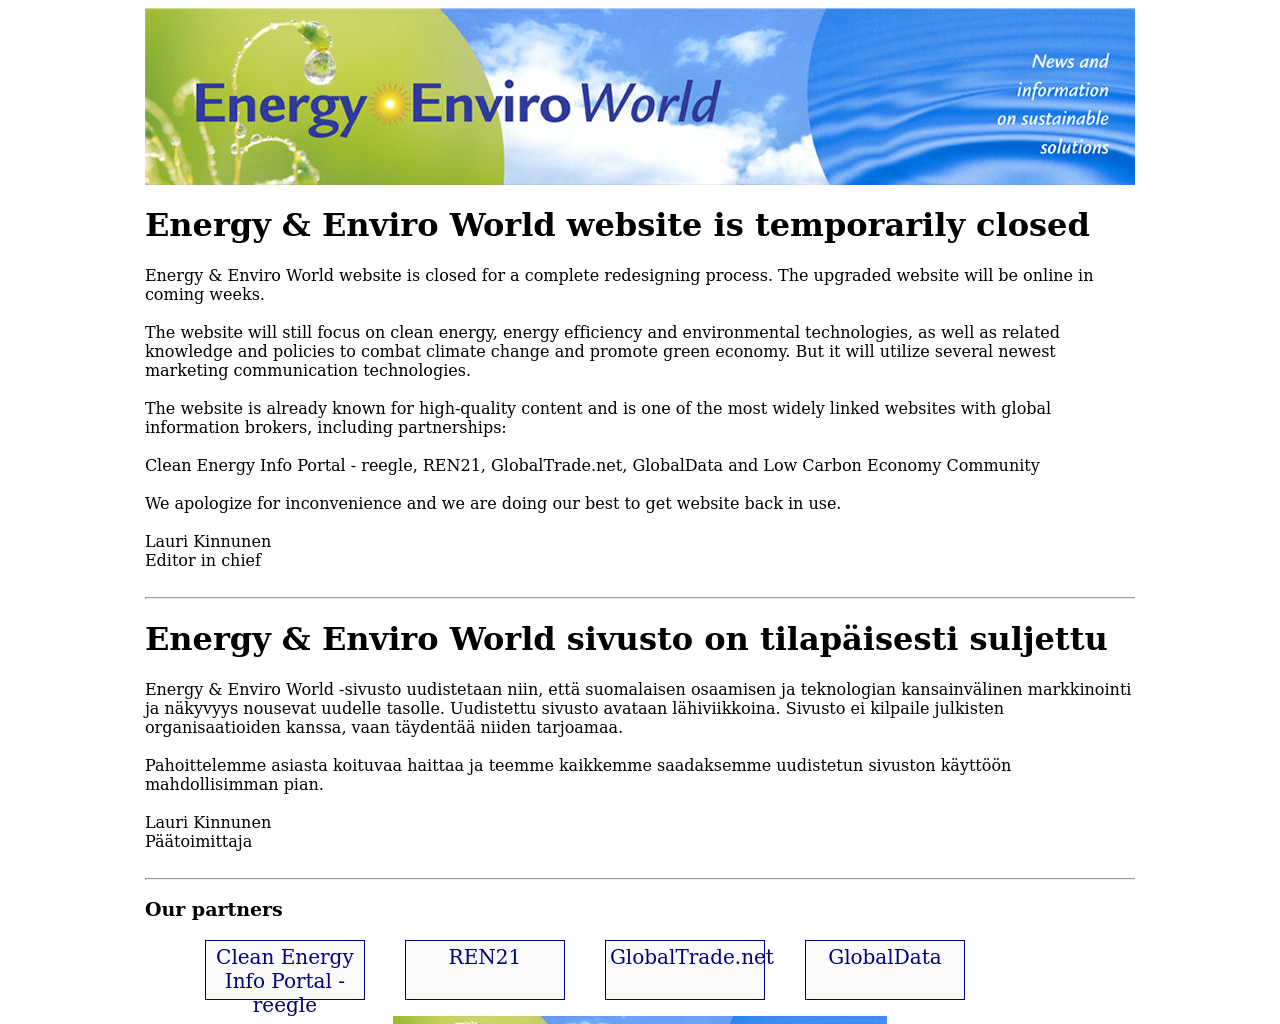 Energy-&-Enviro-World-Advertising-Reviews-Pricing